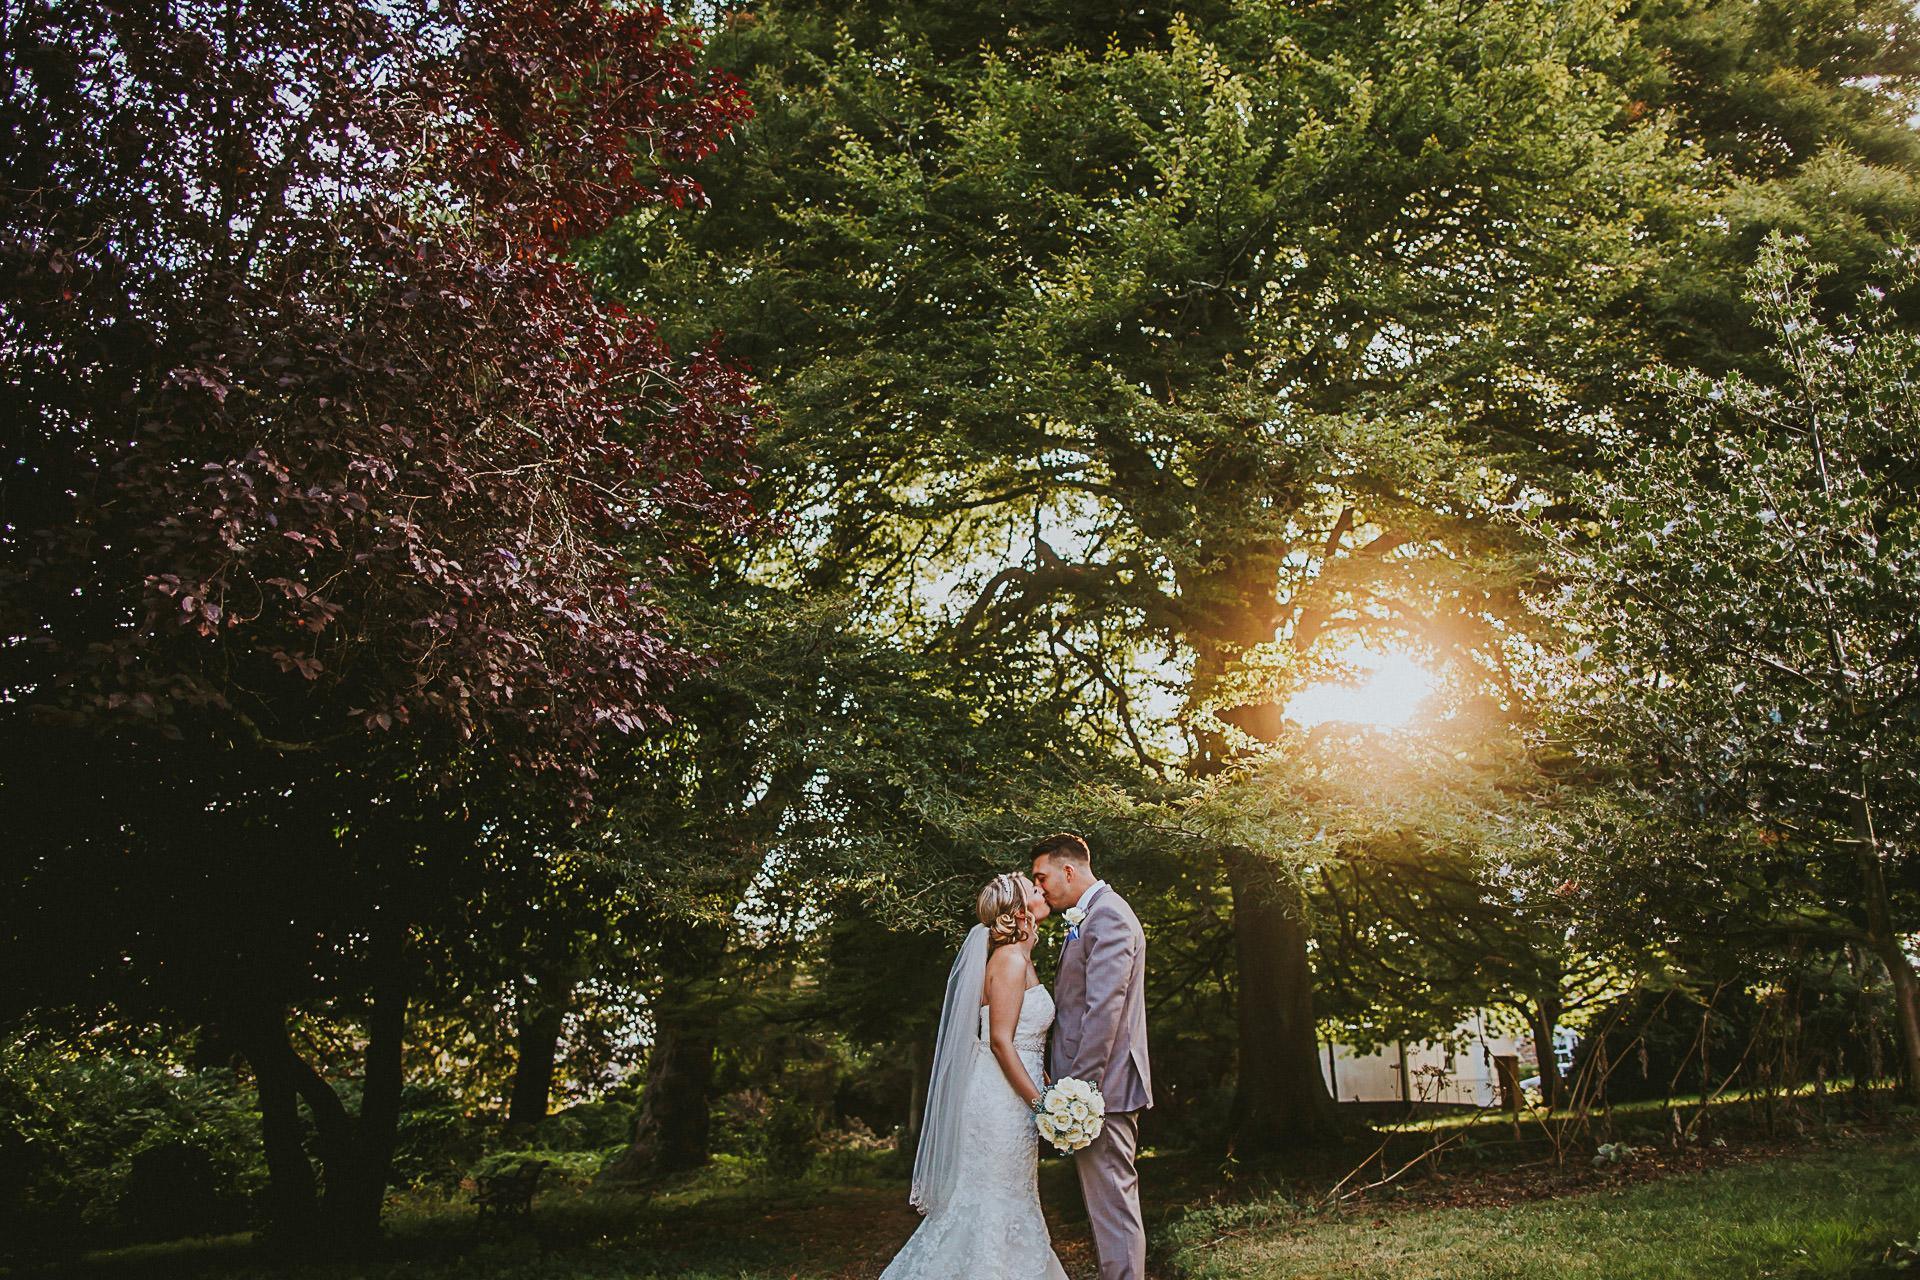 The Alverton Manor - Jenna and Dan Wedding Photographer Cornwall